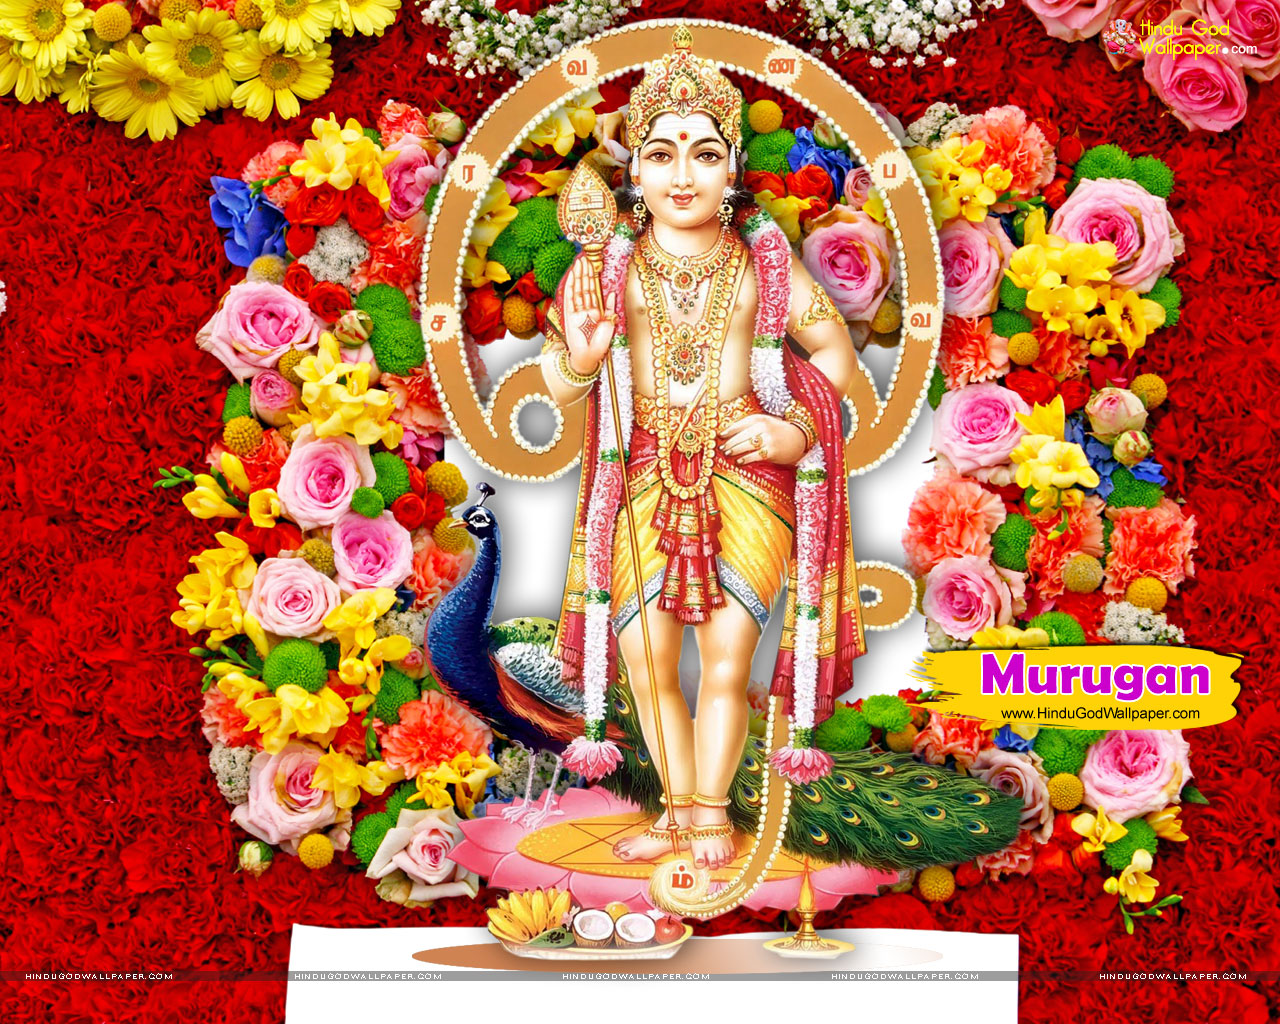 Venkateswara Swamy Hd Wallpapers Lord Murugan Live Wallpaper Free Download